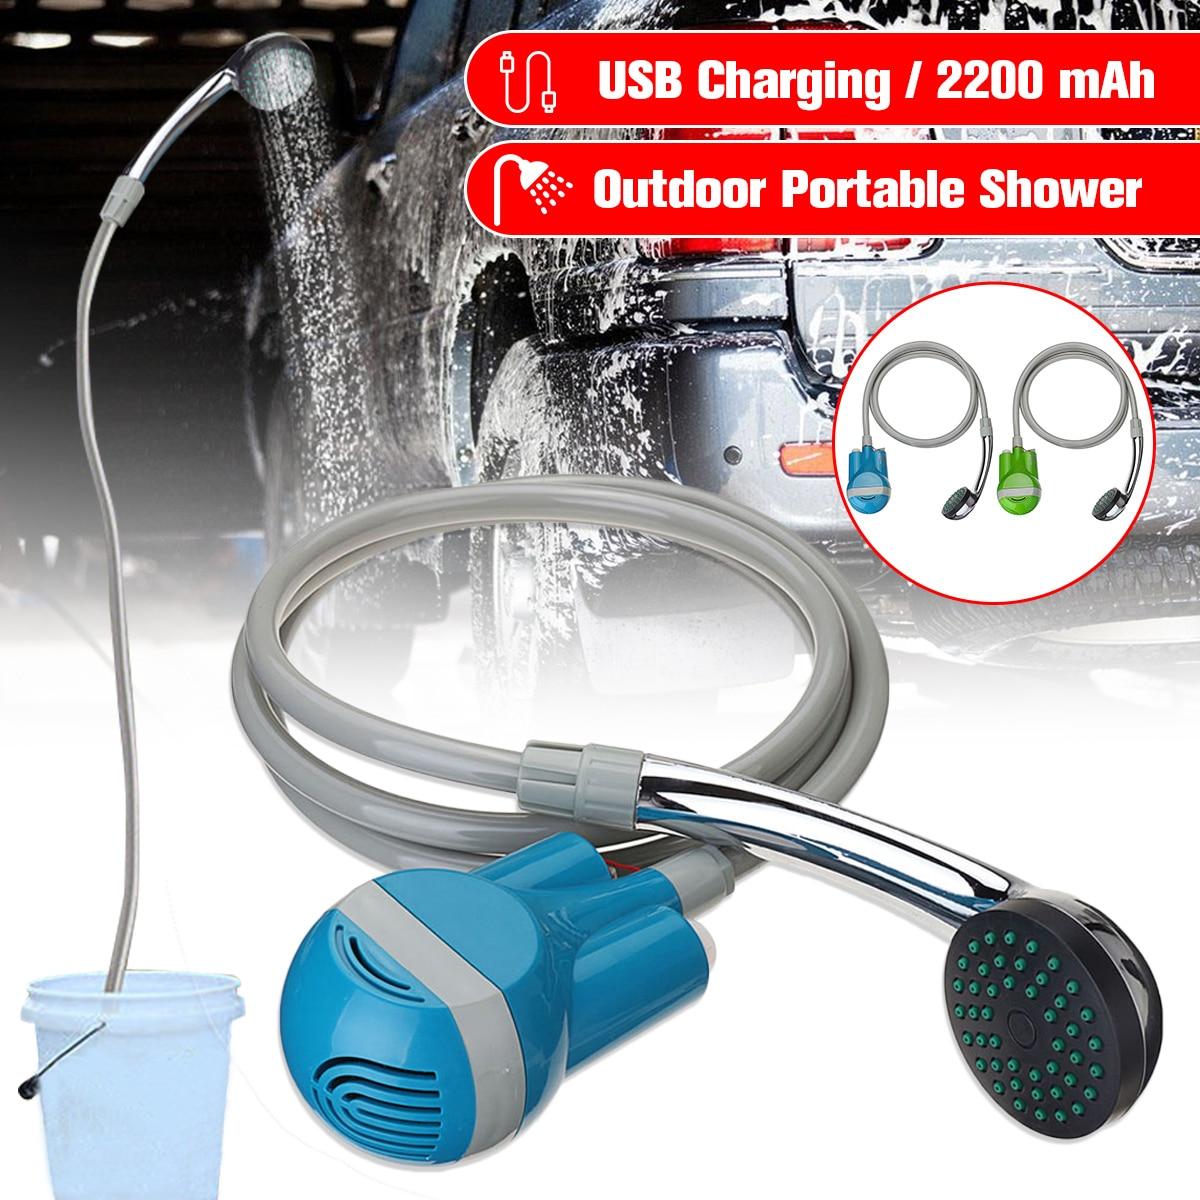 Portable Camping ShowerCar Washer 12V Wireless Car Shower DC 12V pump pressure shower Outdoor Travel Caravan Van Pet Water Tank